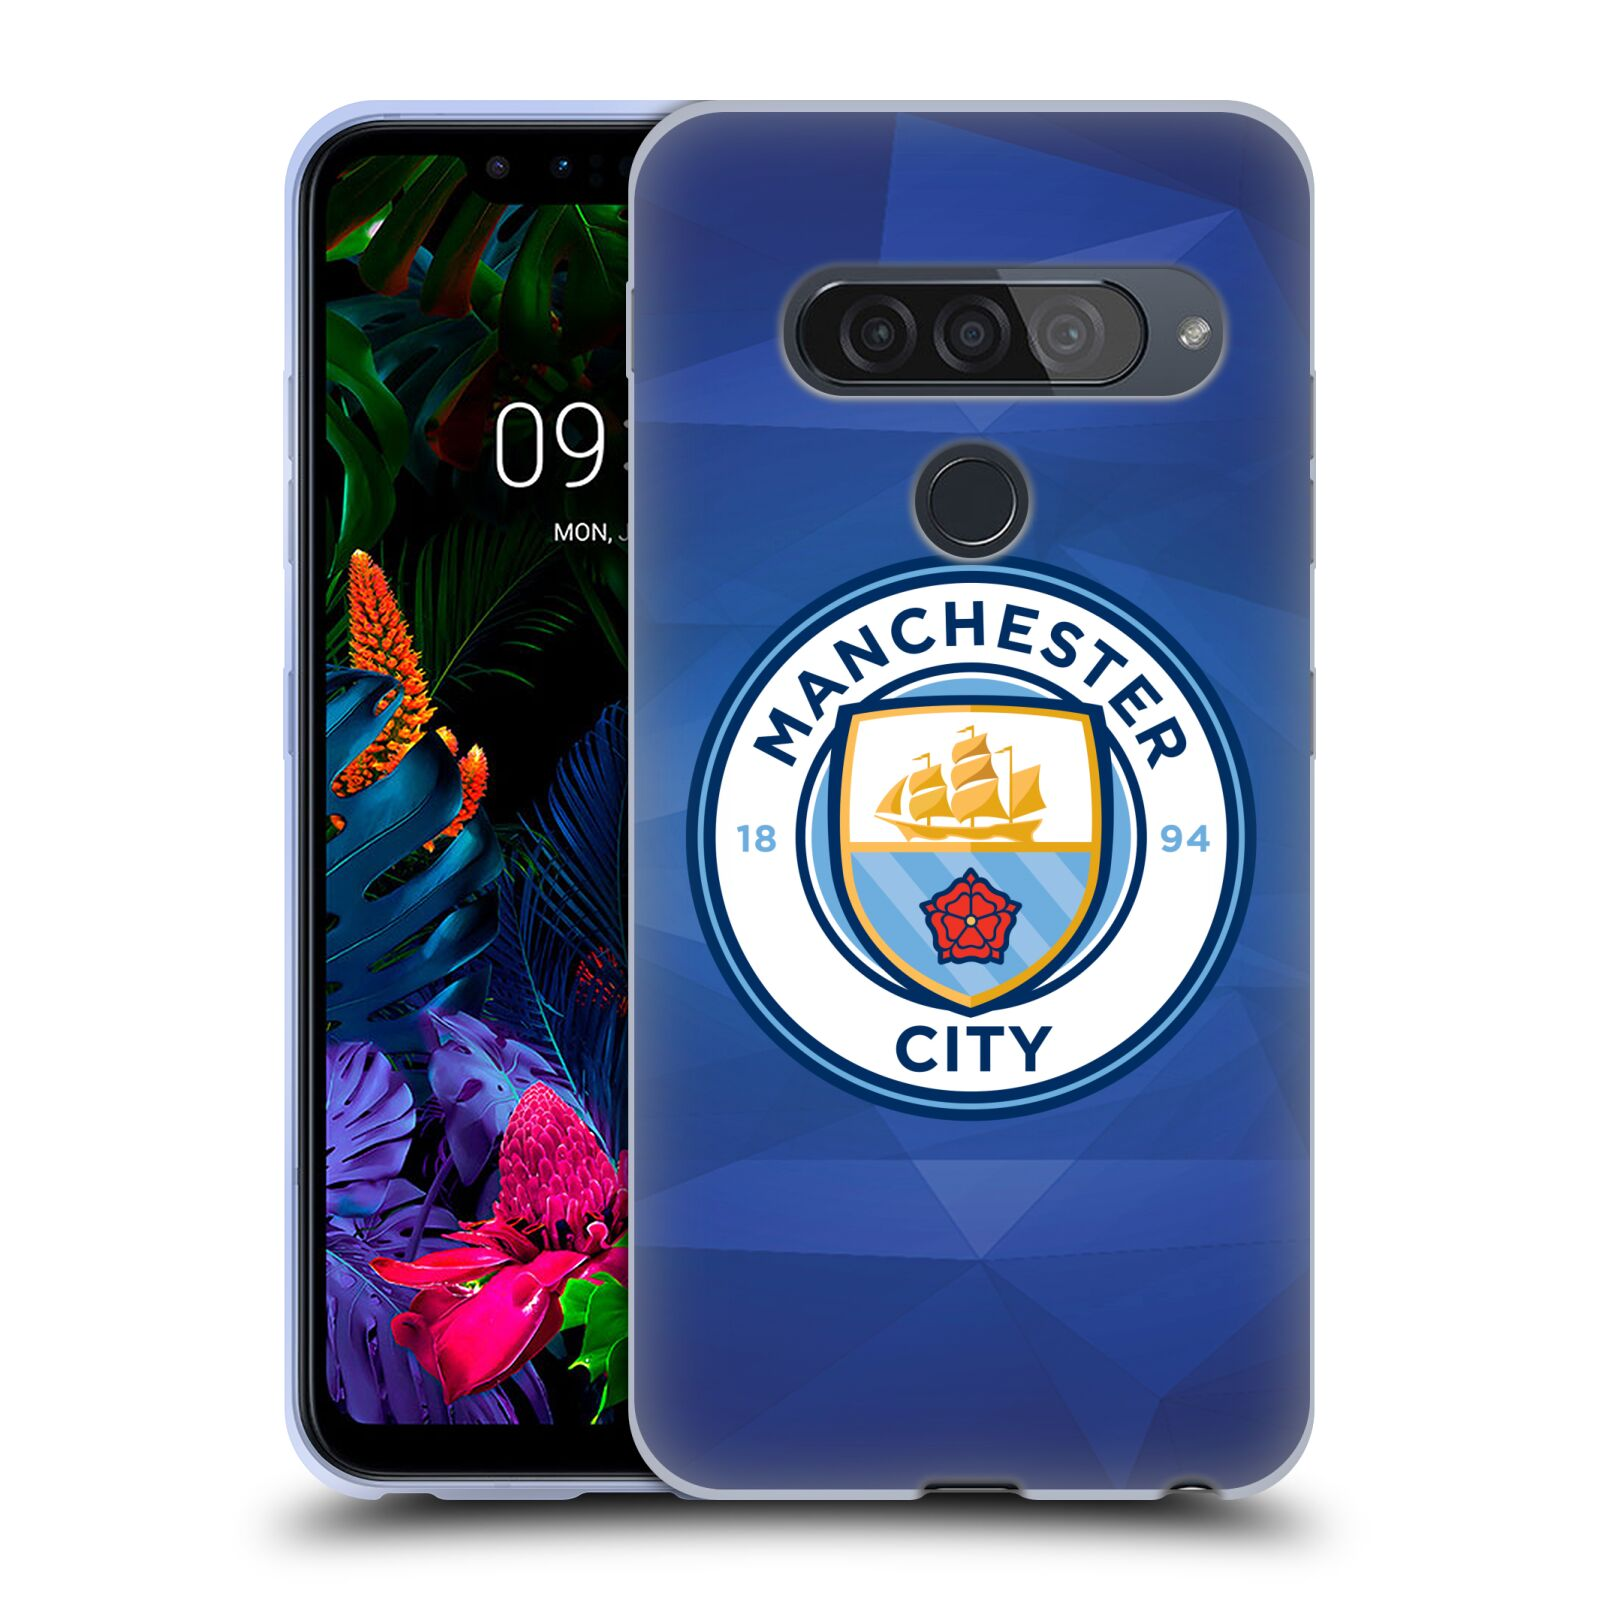 Silikonové pouzdro na mobil LG G8s ThinQ - Head Case - Manchester City FC - Modré nové logo